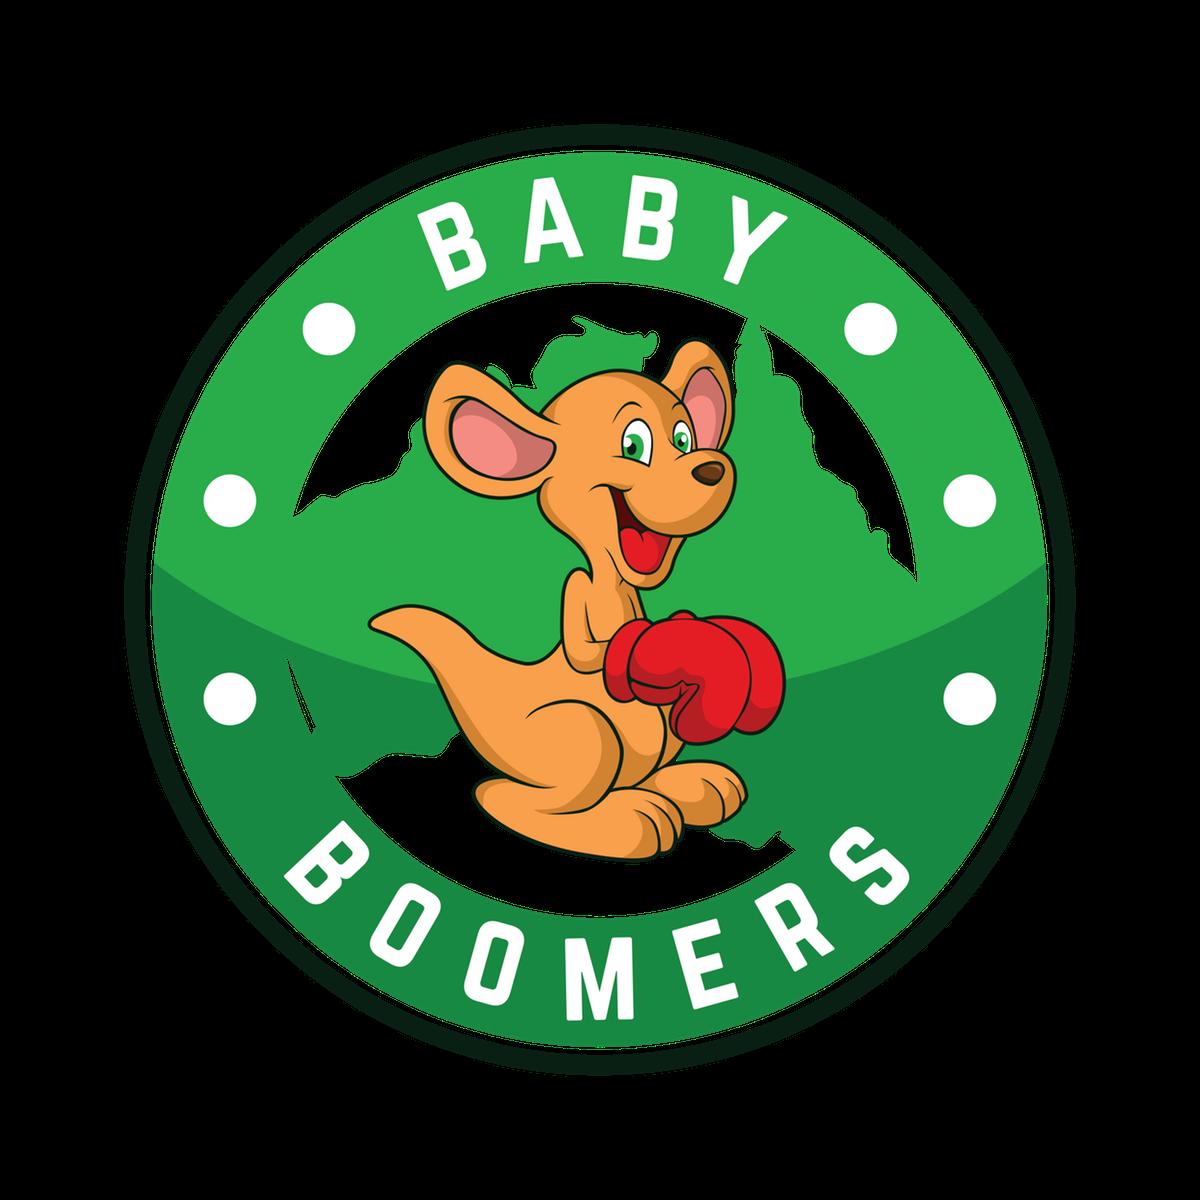 Revision - Baby Boomer logo